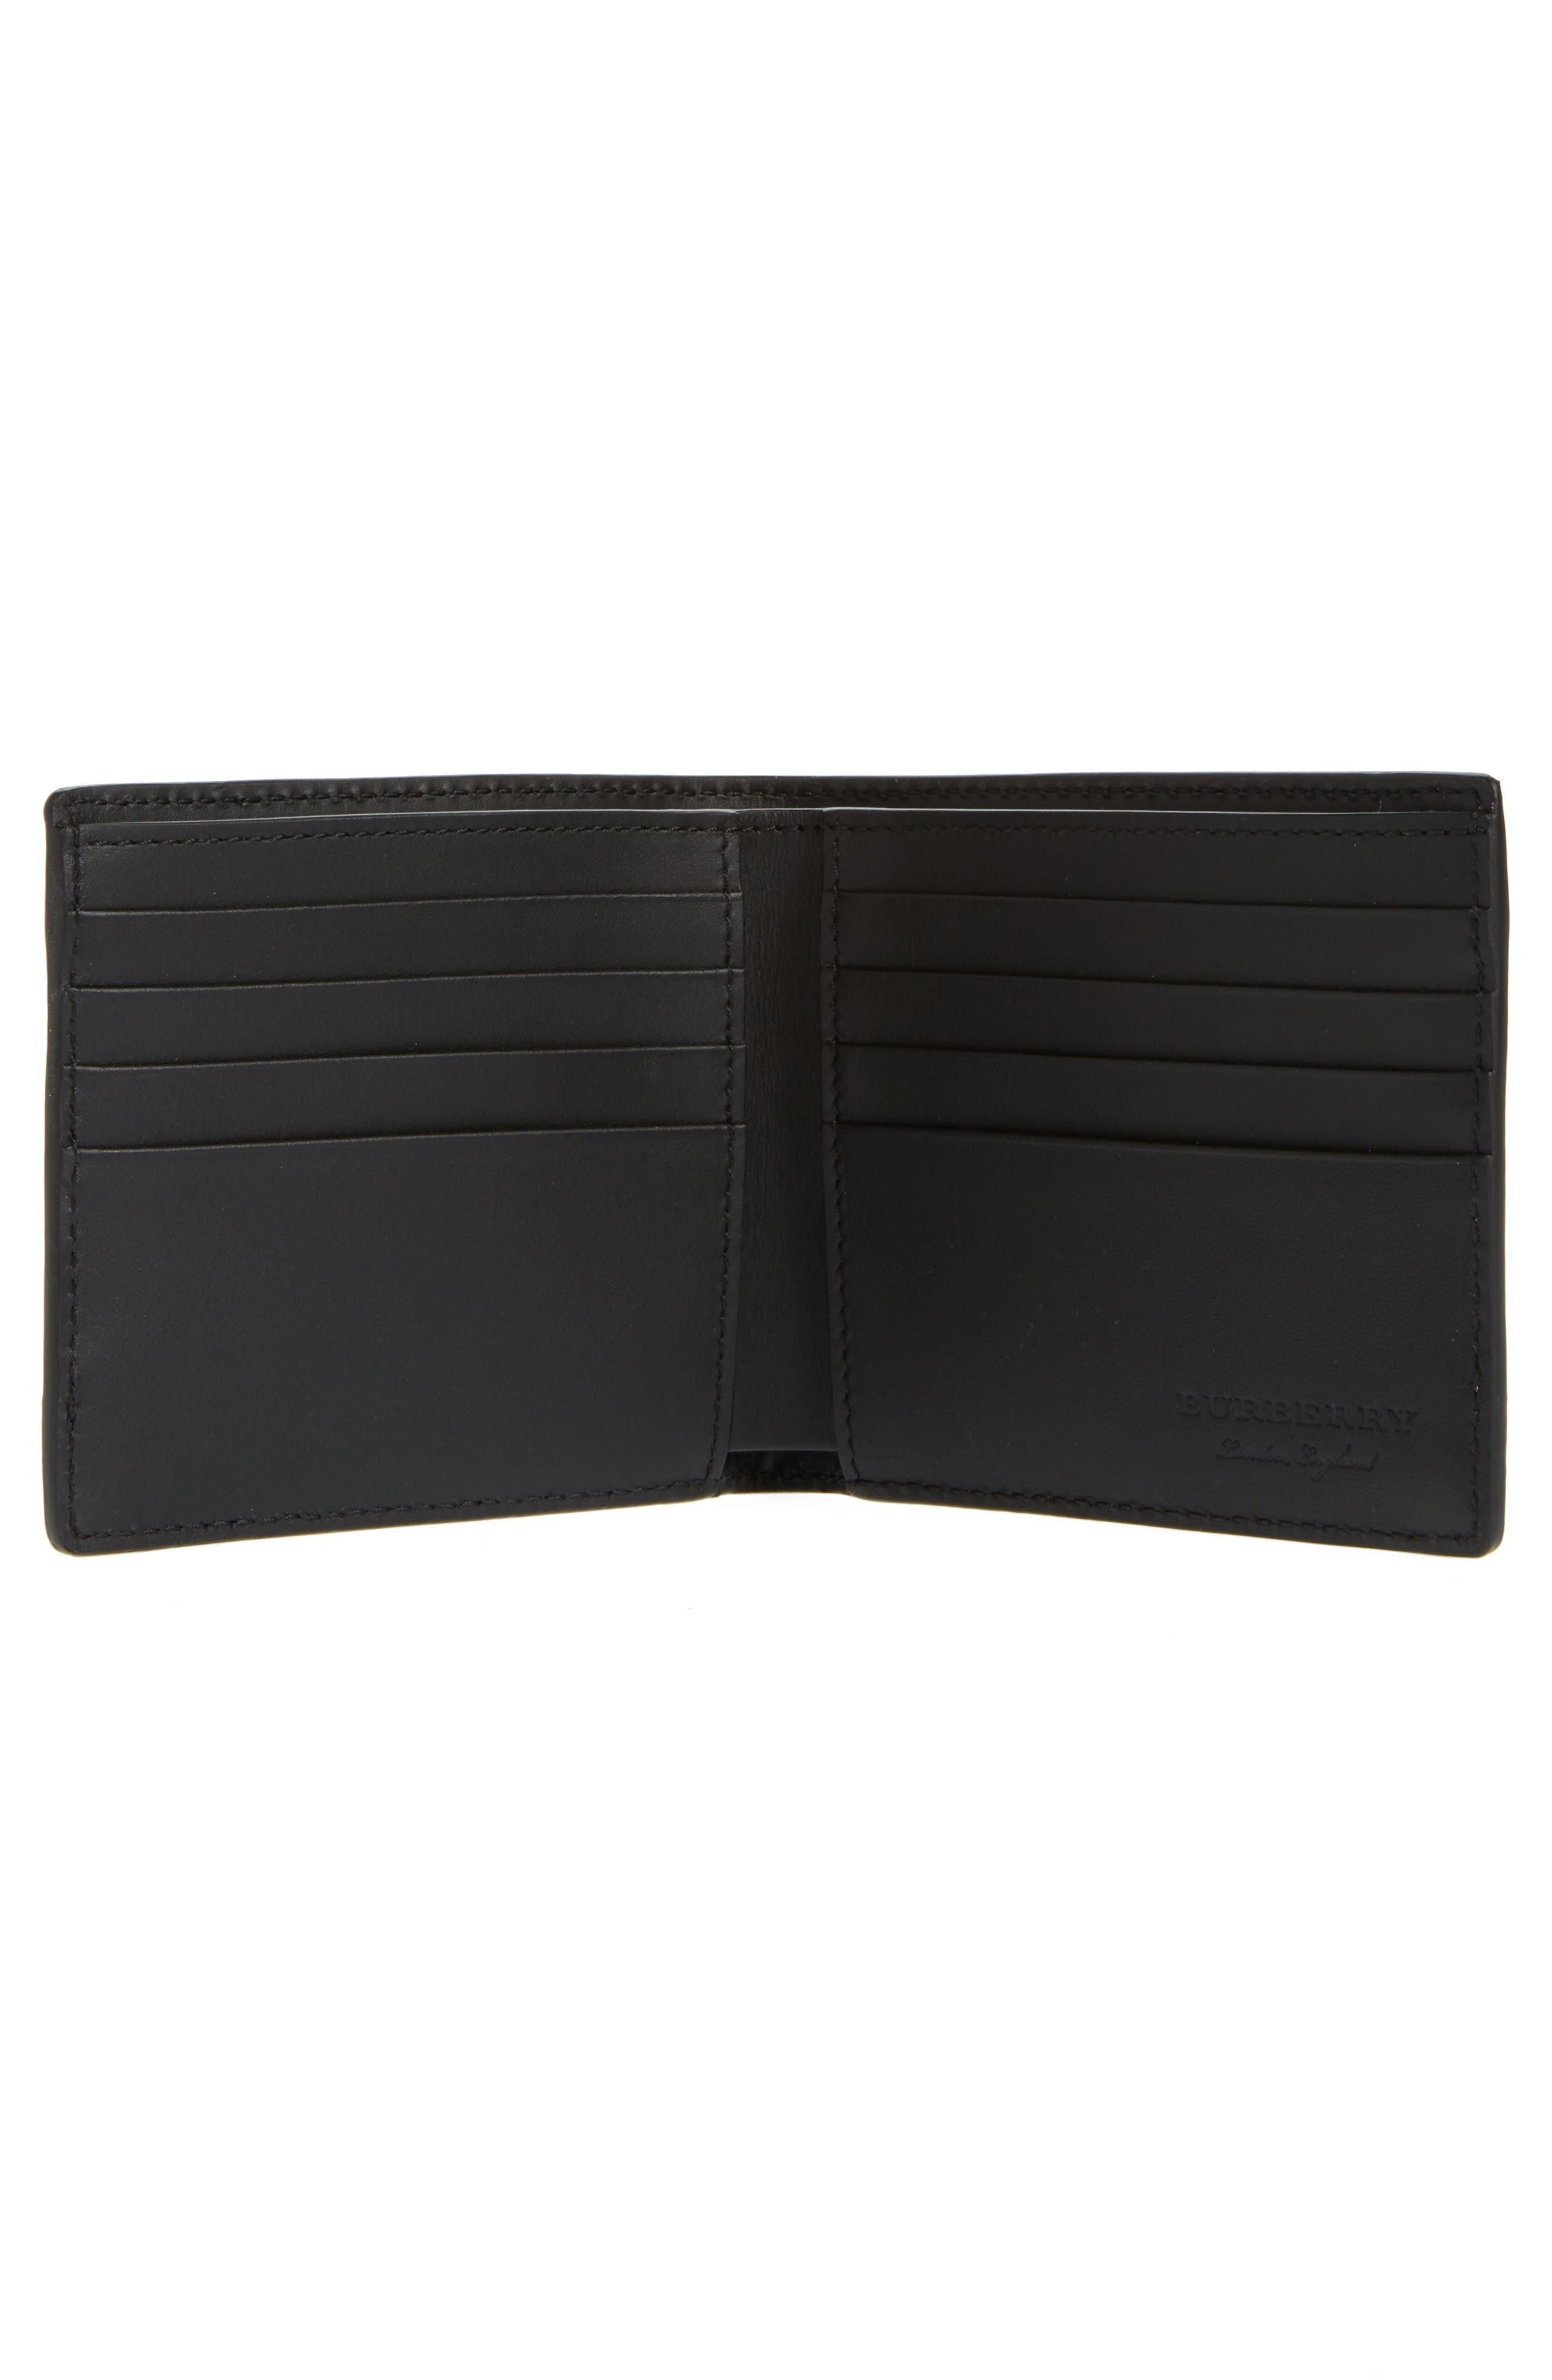 Haymarket Check Wallet,                             Alternate thumbnail 2, color,                             001